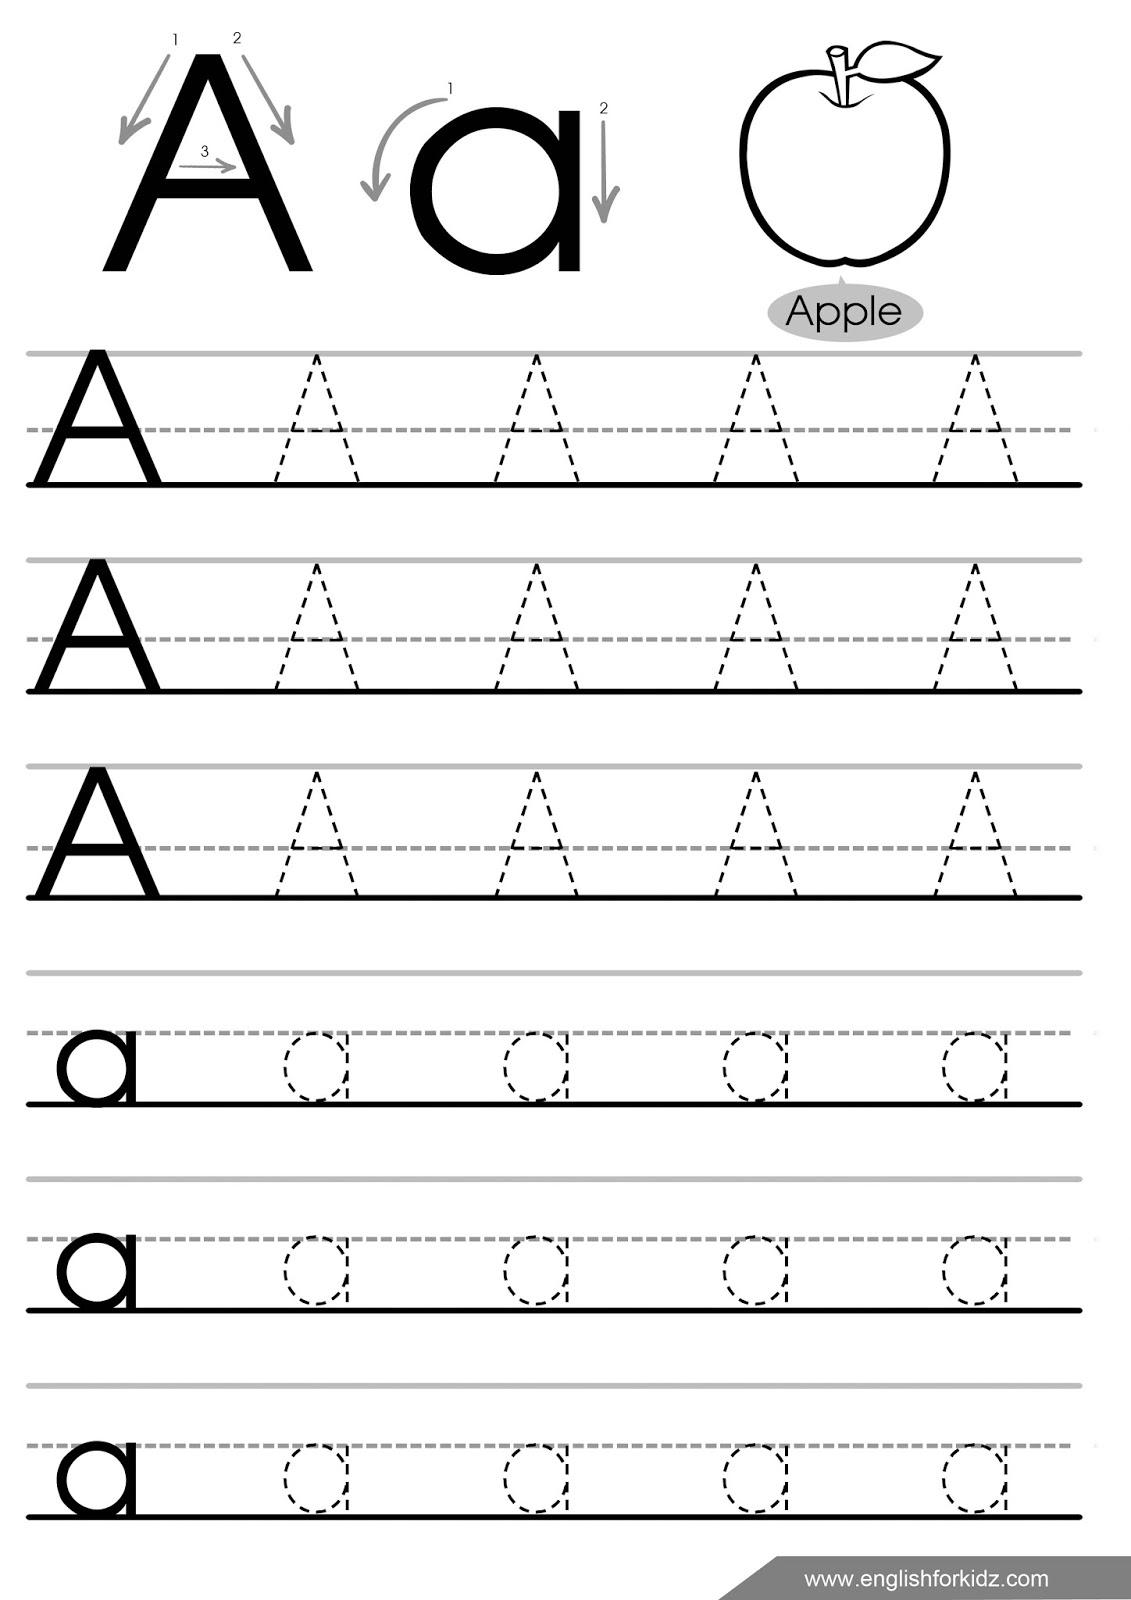 Letter tracing worksheets for preschool